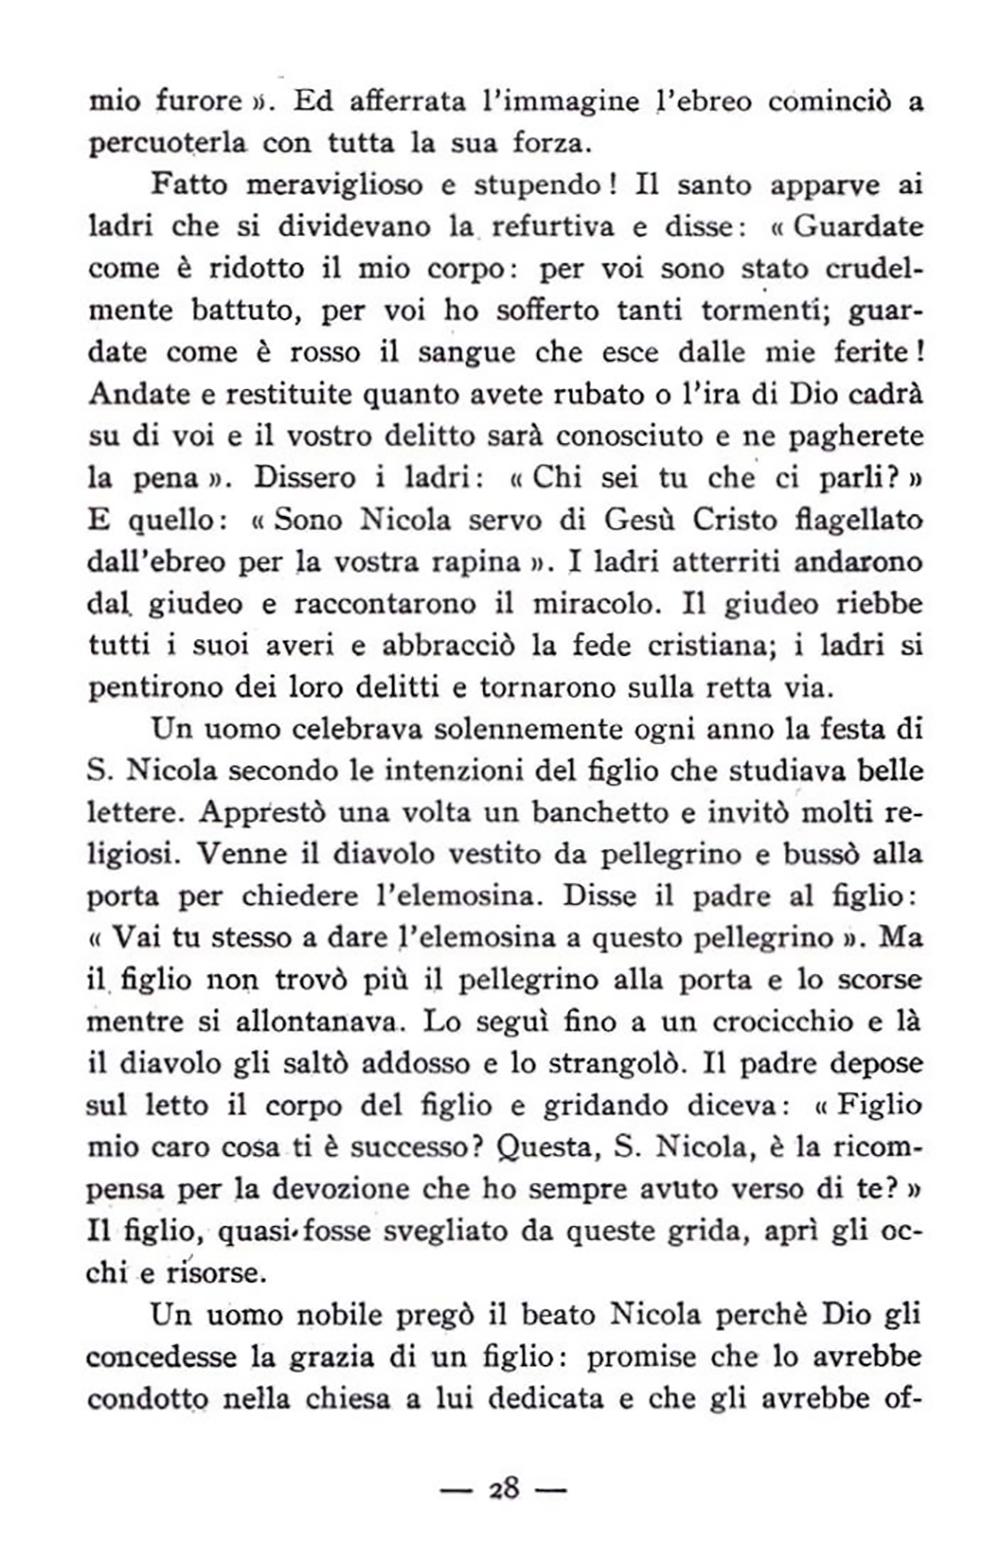 Jacopo da Varagine, Leggenda aurea, Traduzione di C. Lisi, Firenze, Libreria Editrice Fiorentina,1999